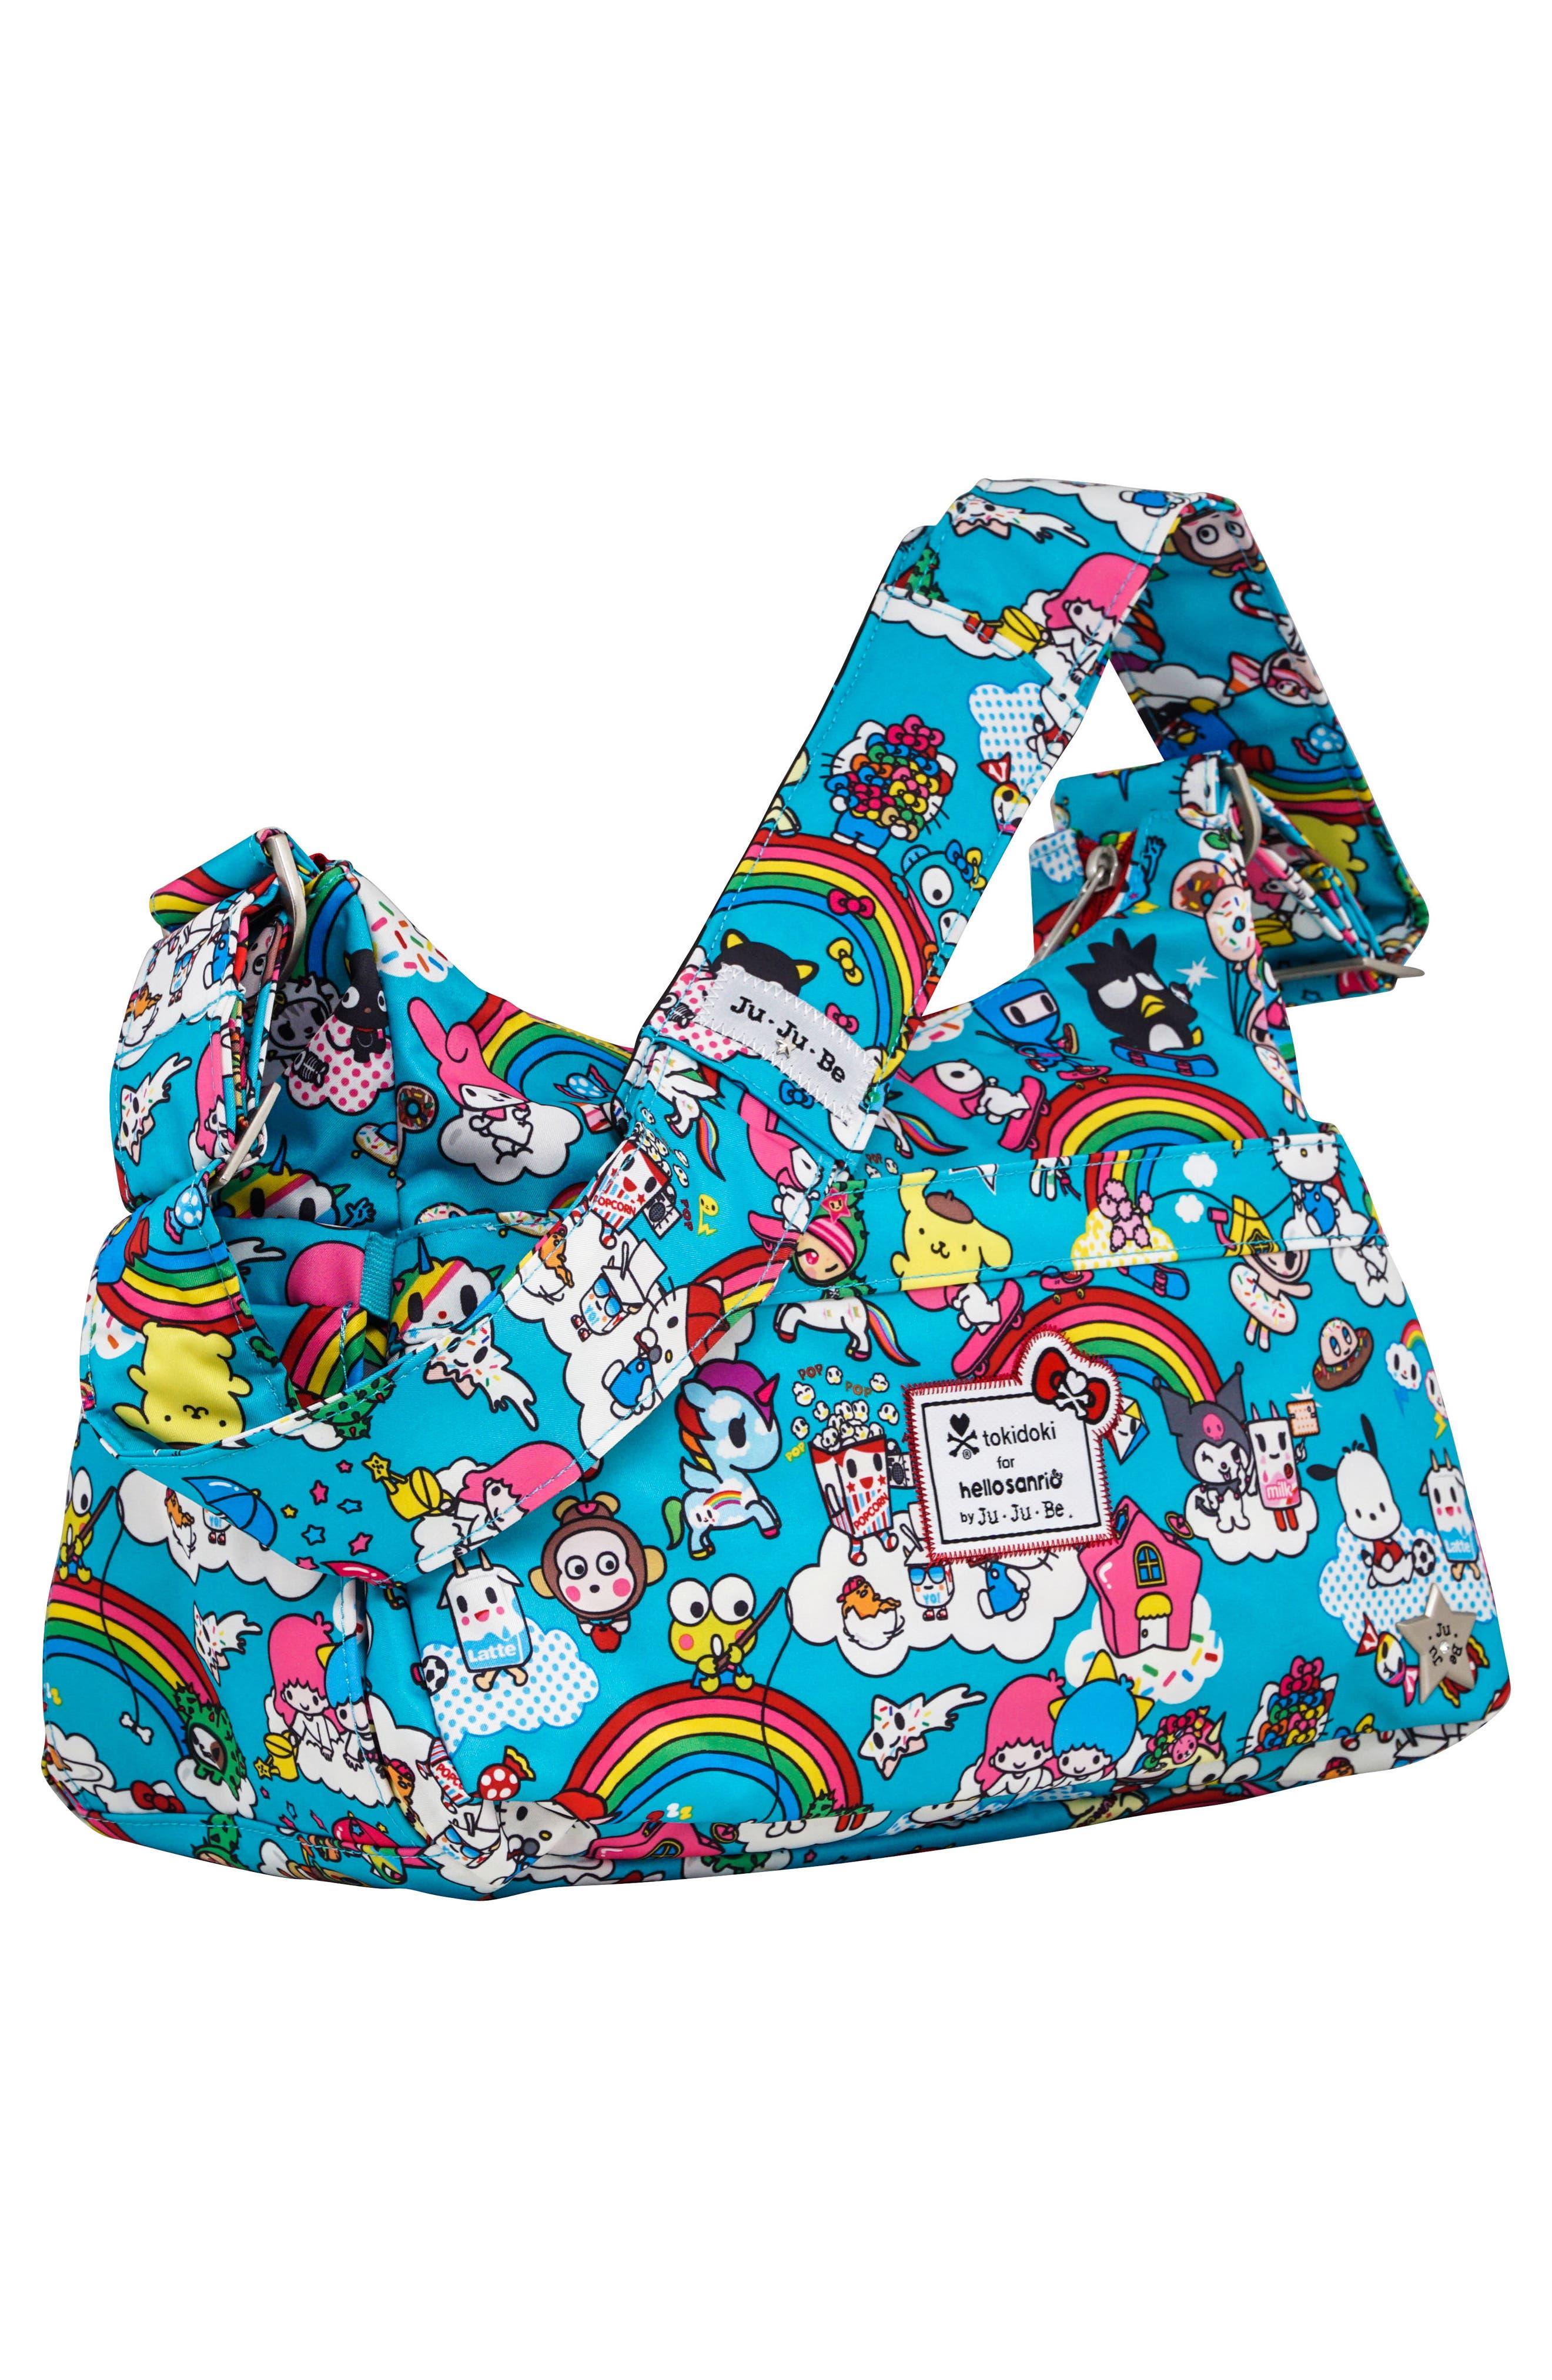 x tokidoki for Hello Sanrio Rainbow Dreams Be Hobo Diaper Bag,                             Alternate thumbnail 2, color,                             Rainbow Dreams